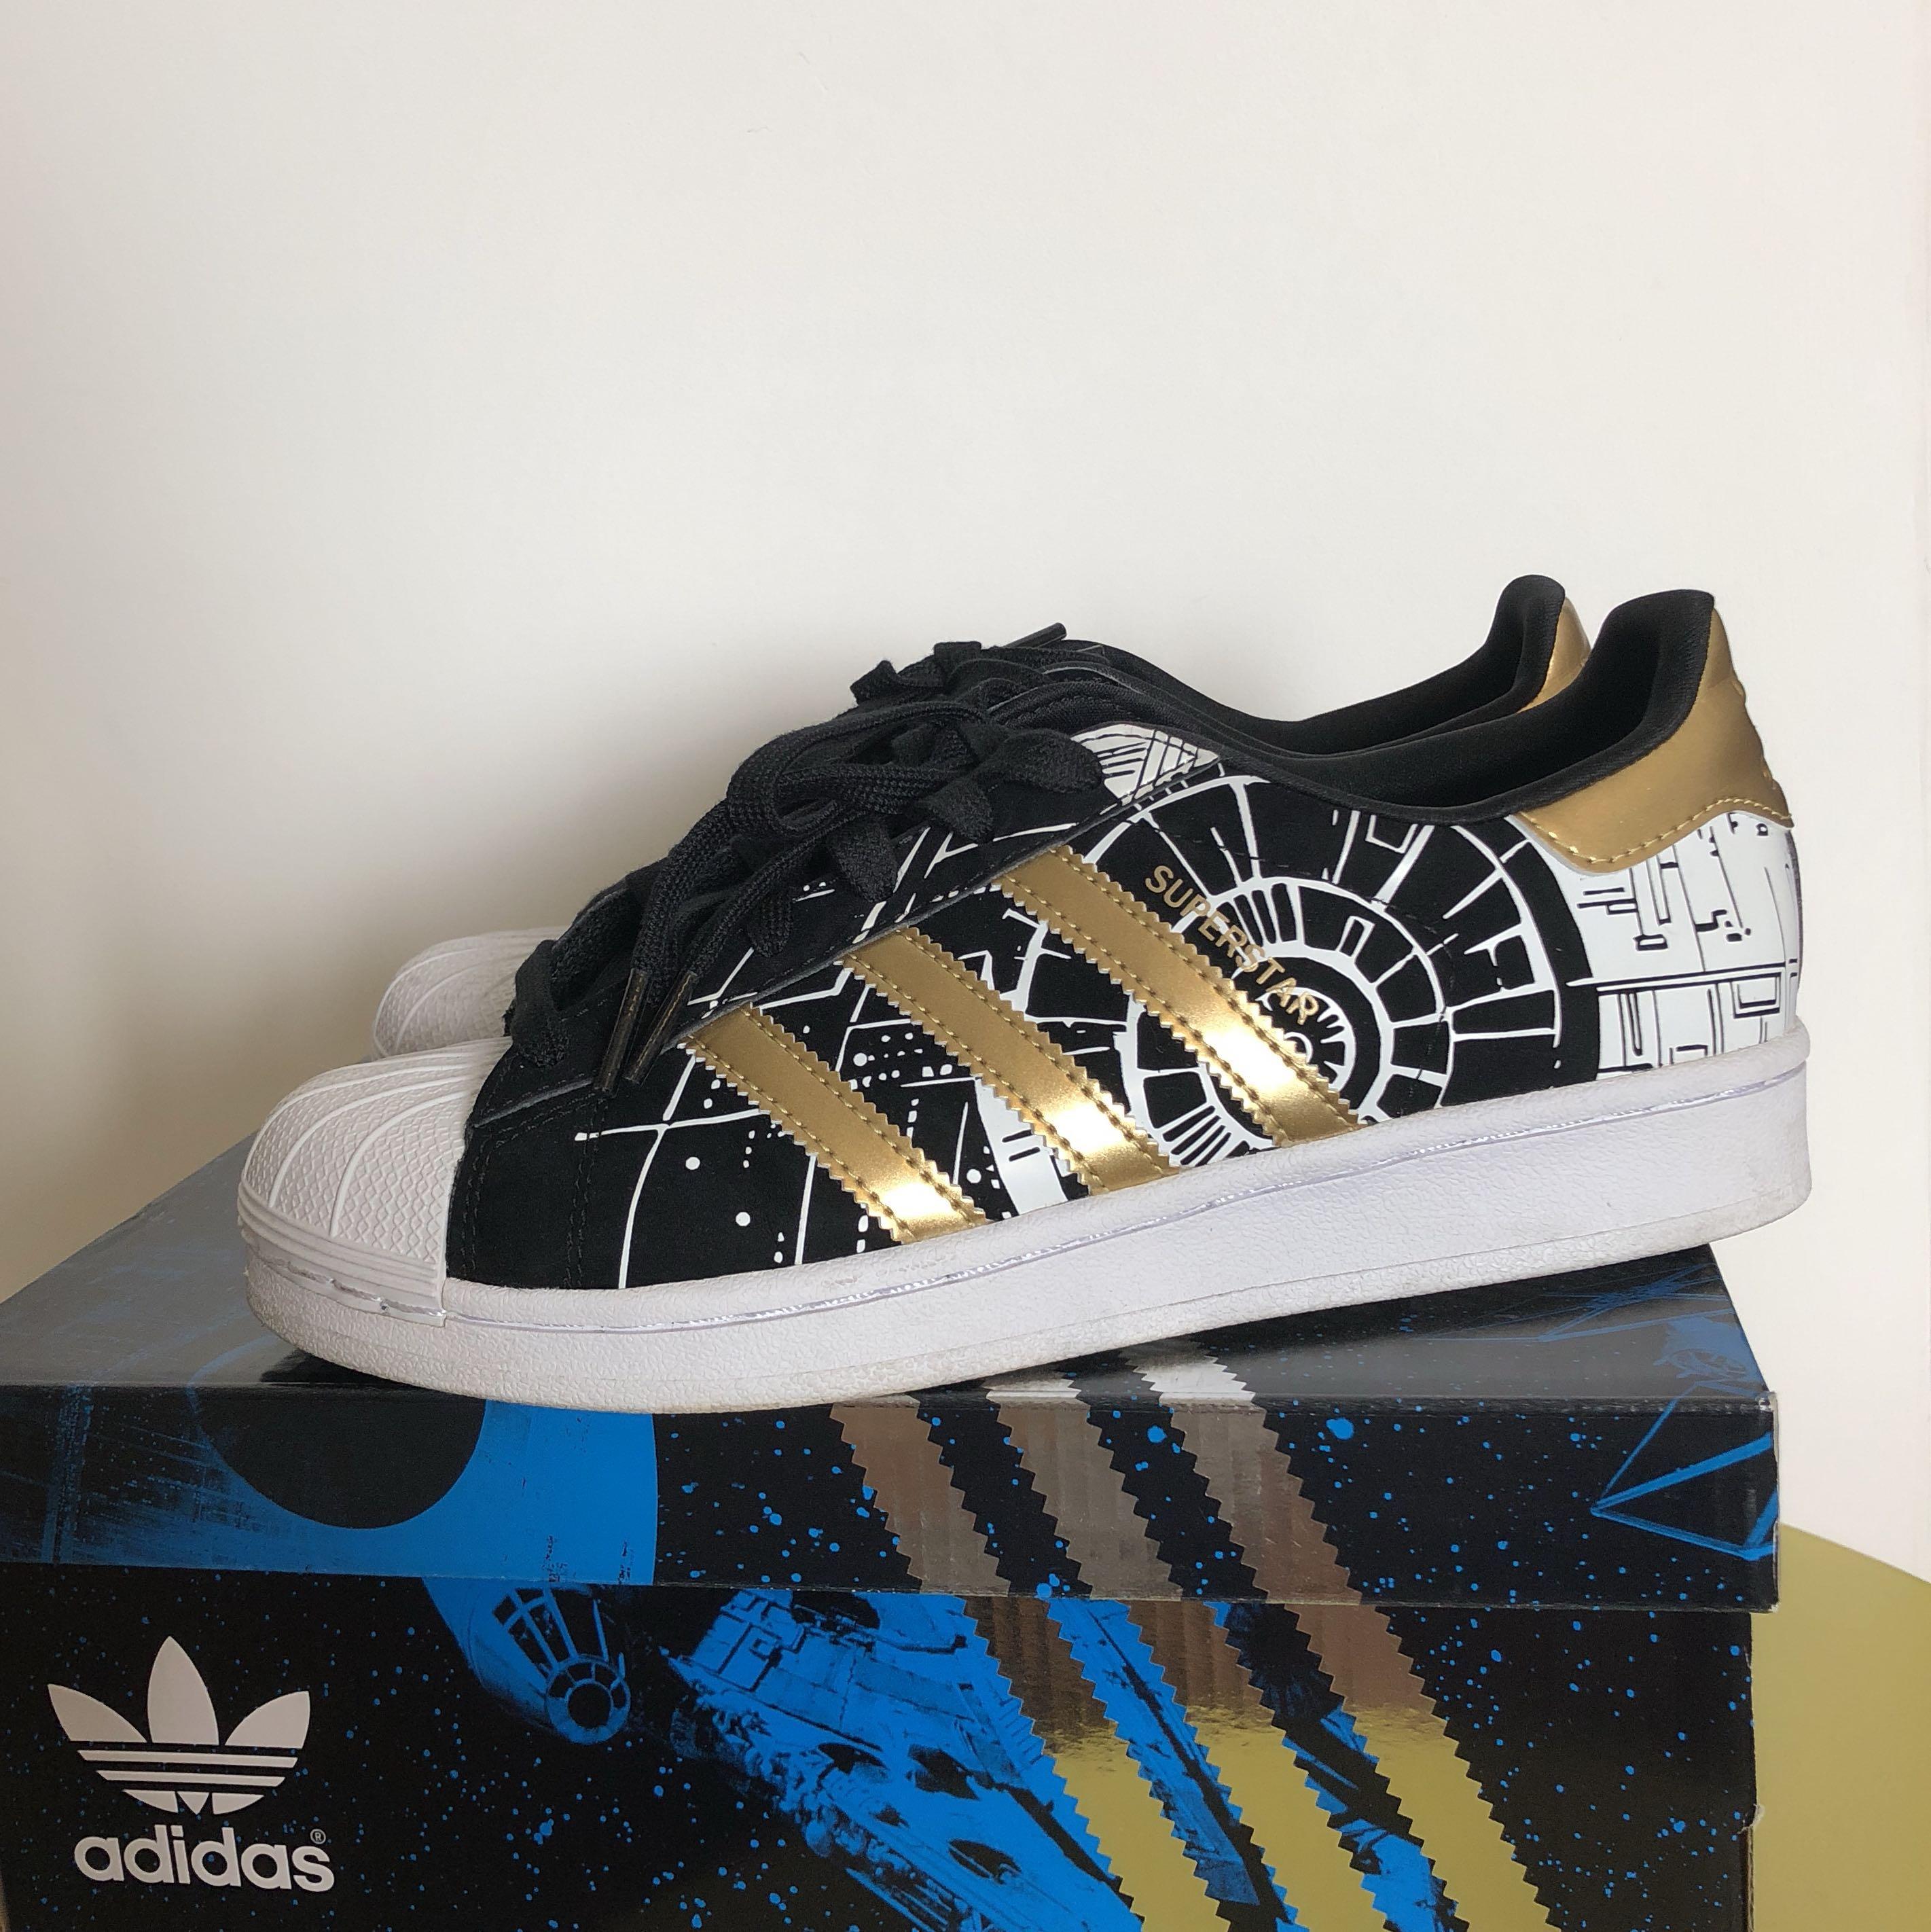 hot sales d45f9 fc6ed Adidas Originals Superstar x Star Wars, Men s Fashion, Footwear ...